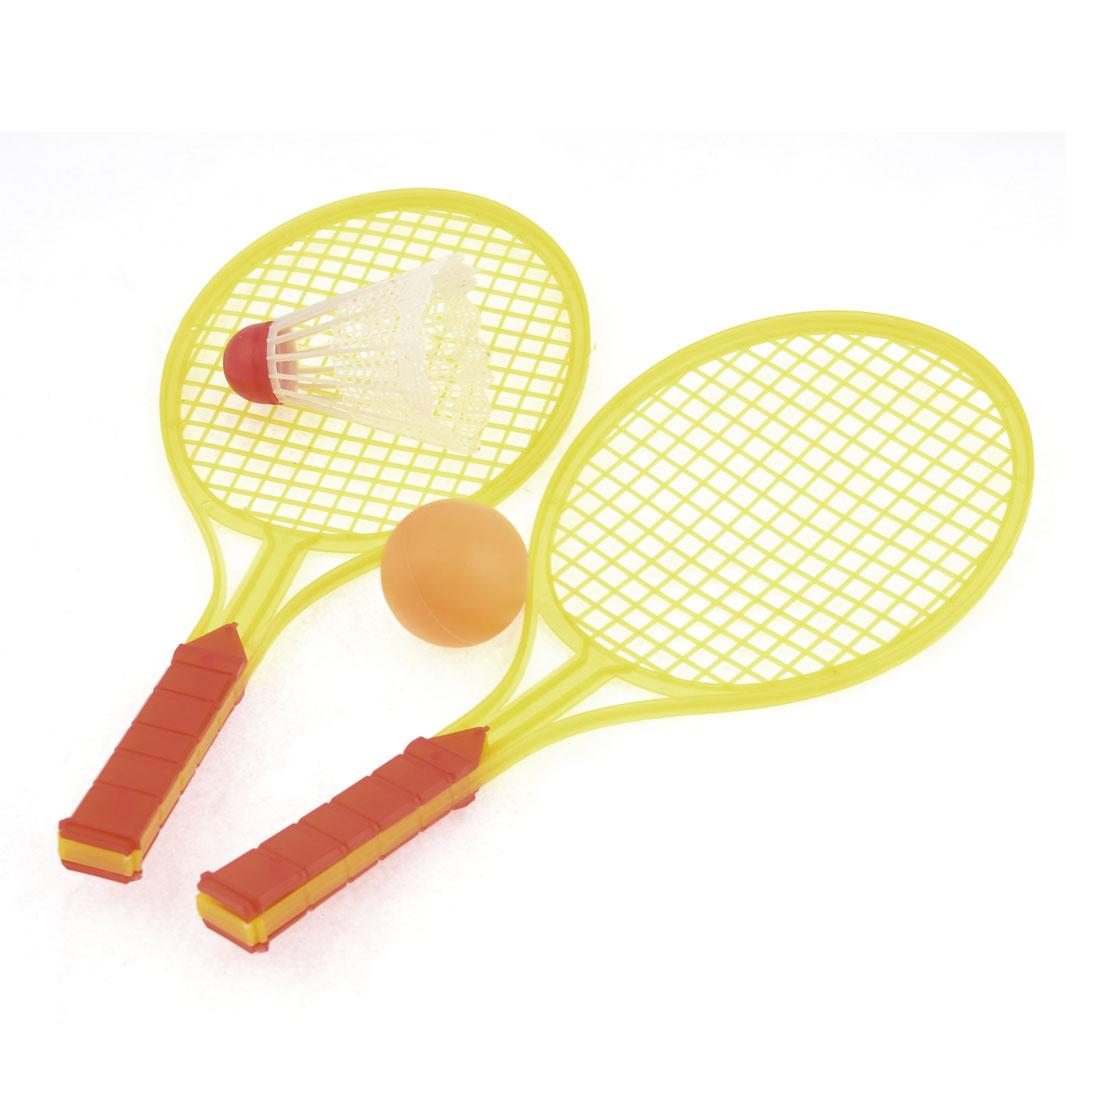 2pcs Yellow Badminton Racket w White Ball Plastic Toy for Children